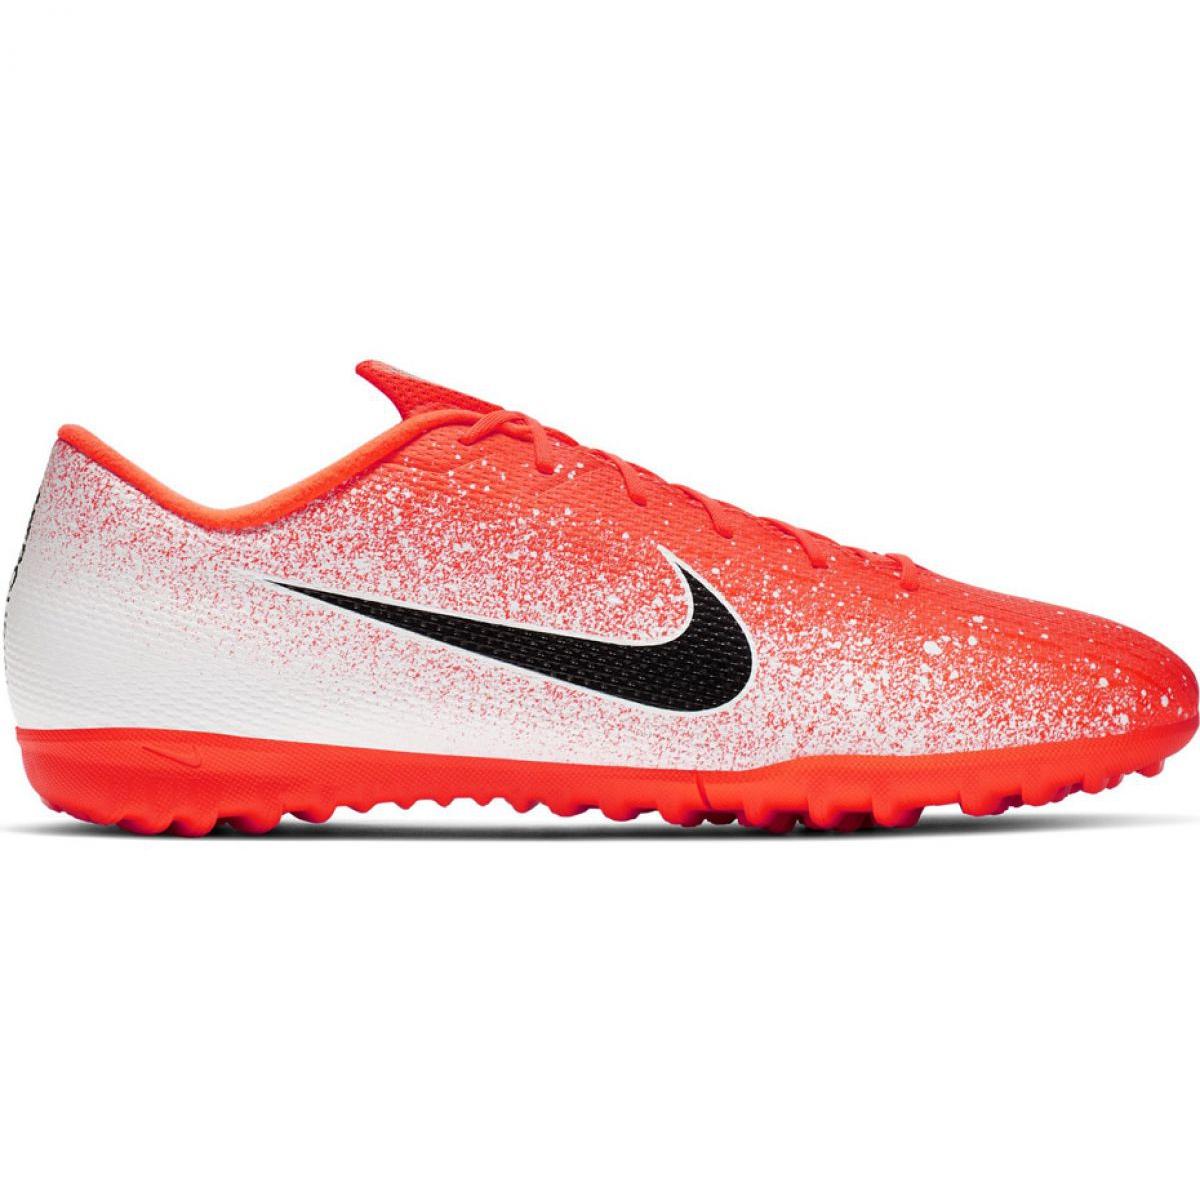 info for 3cf3e 06a8b Nike Mercurial Vapor X 12 Academy Tf M AH7384-801 Football Boots